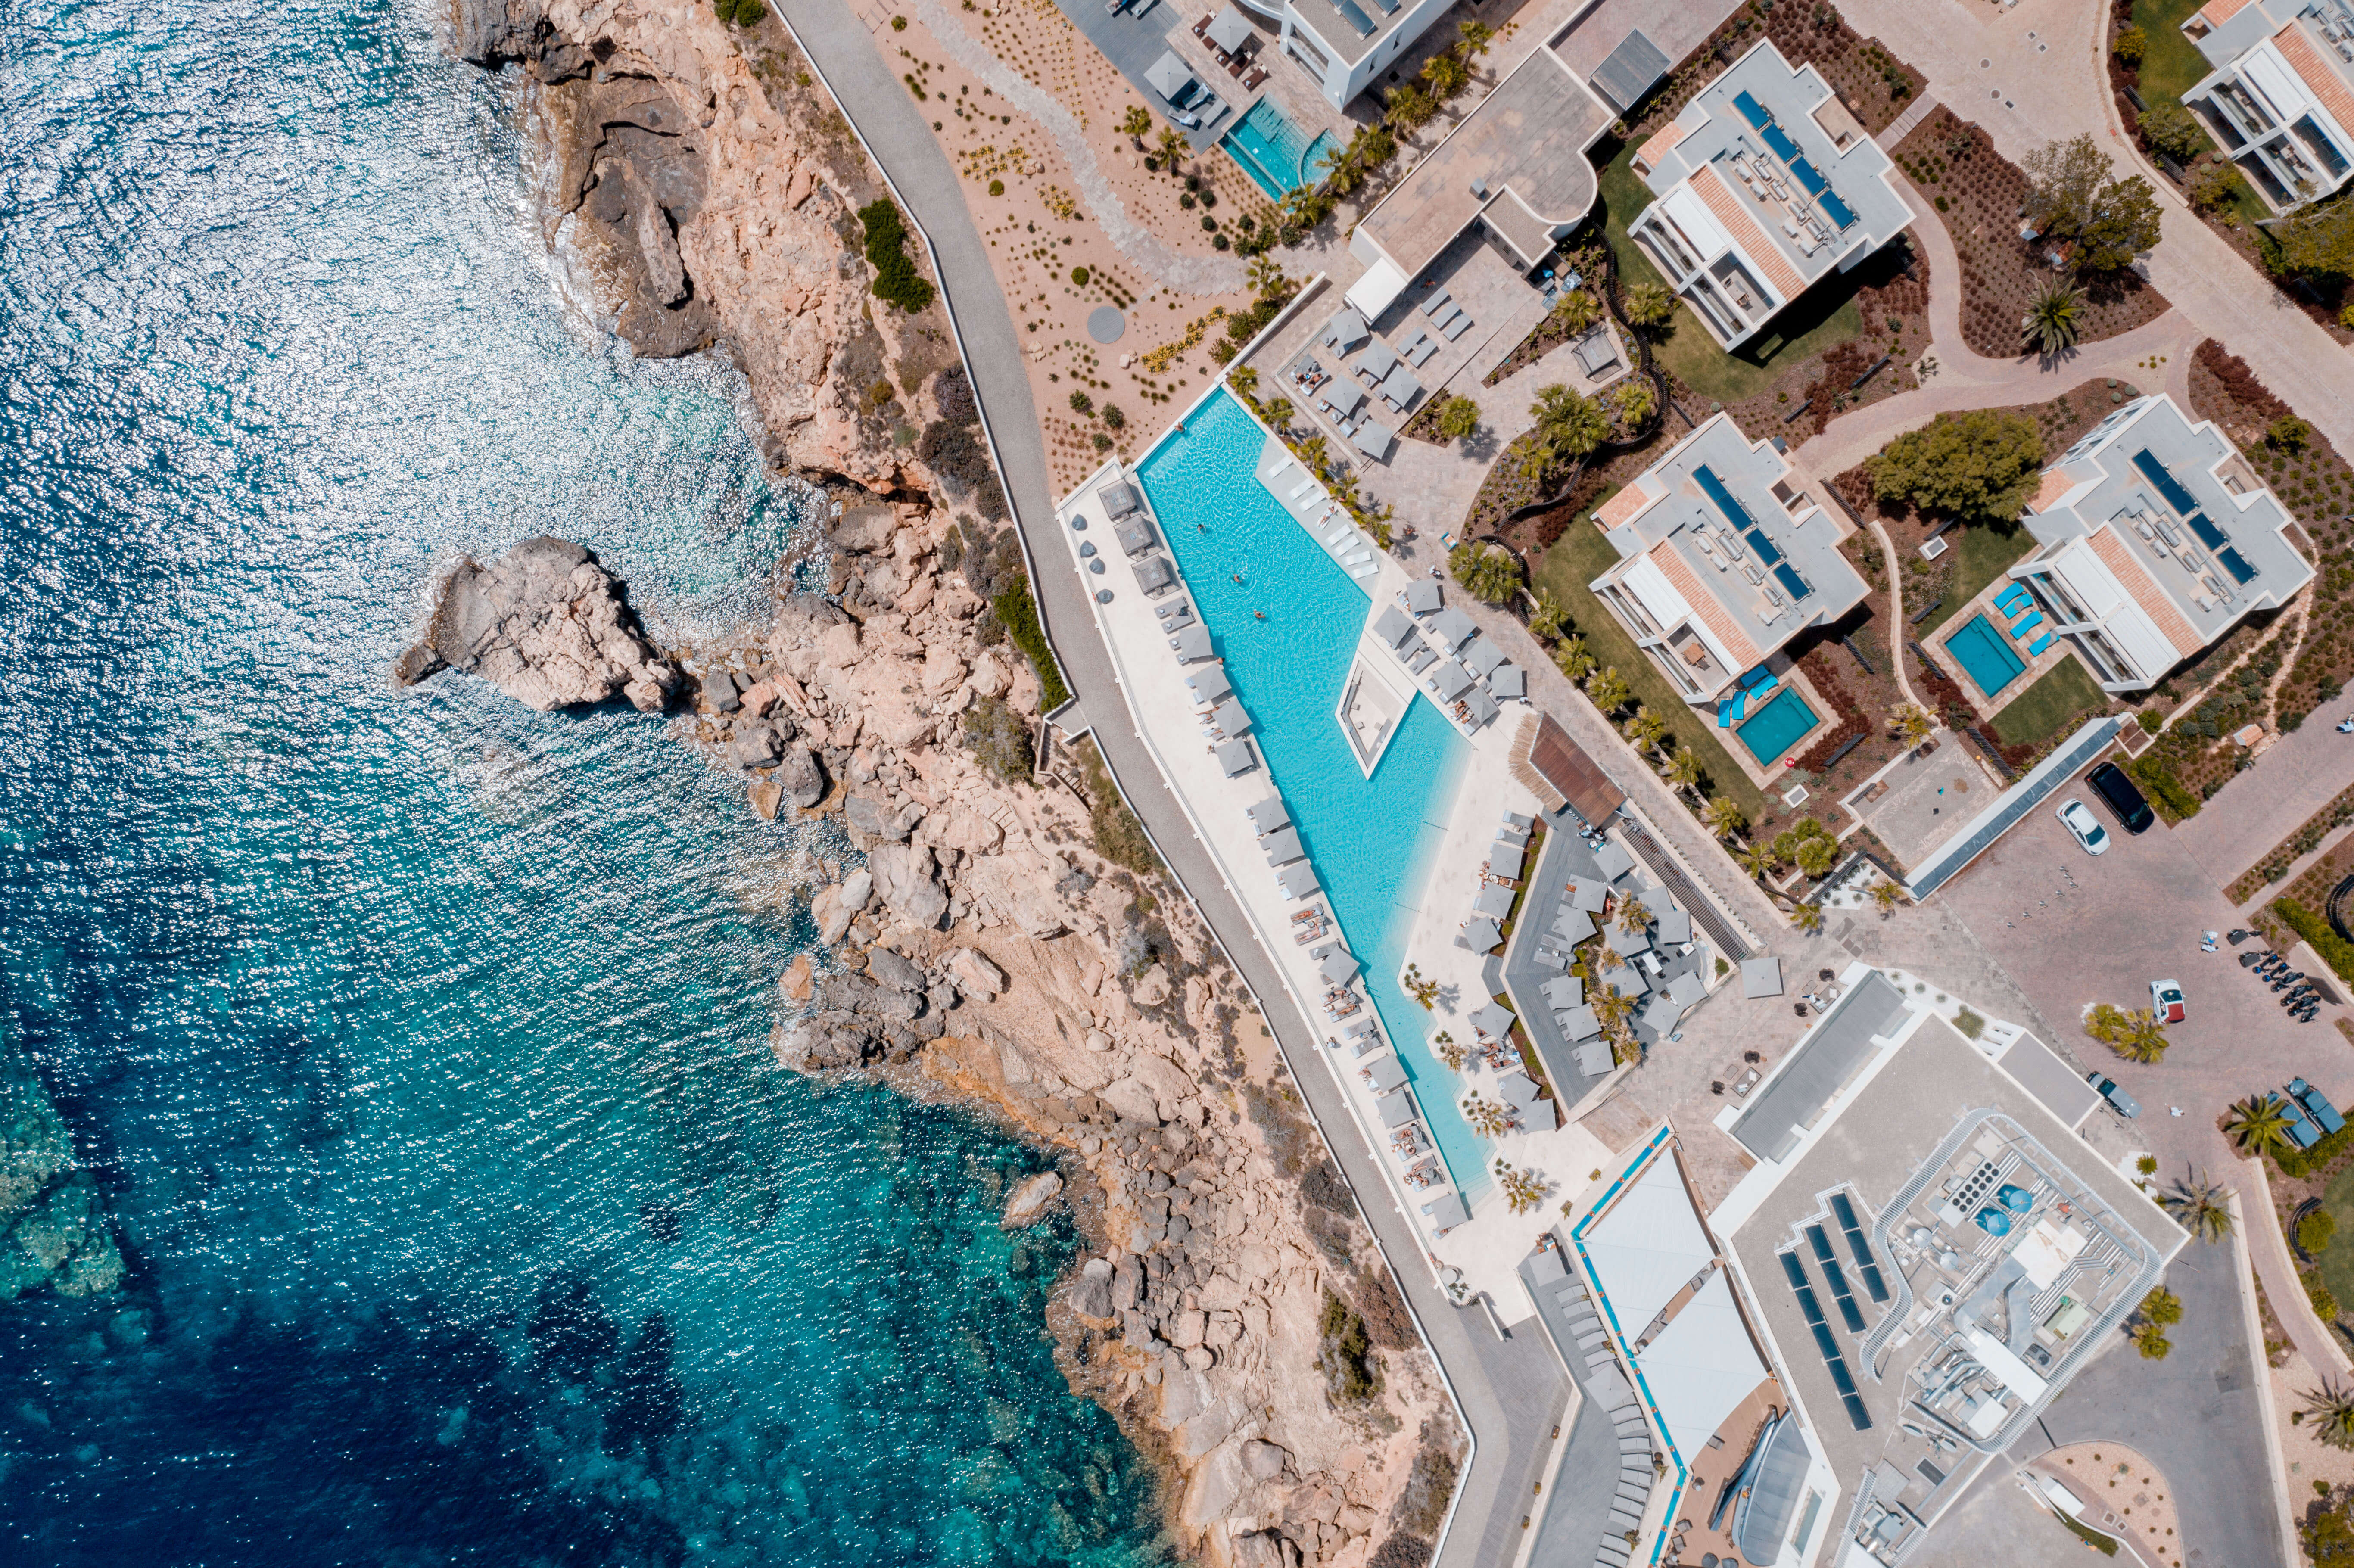 7Pines-Resort-Ibiza-Aerial